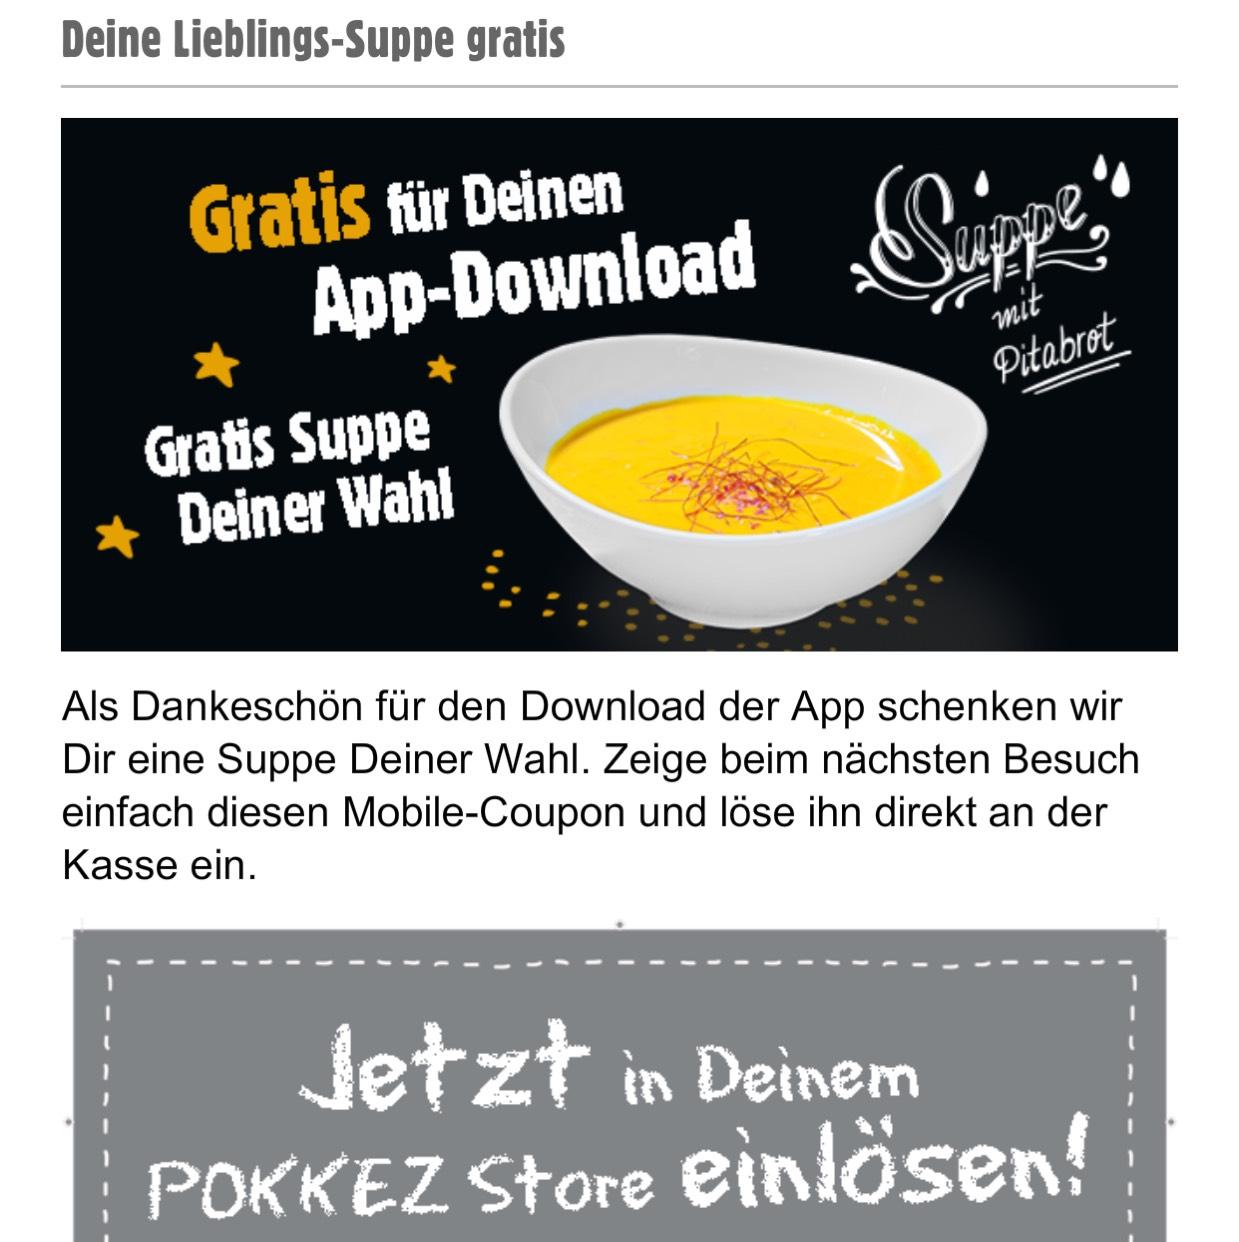 [Lokal Stuttgart] gratis Suppe mit Pitabrot bei Pokkez